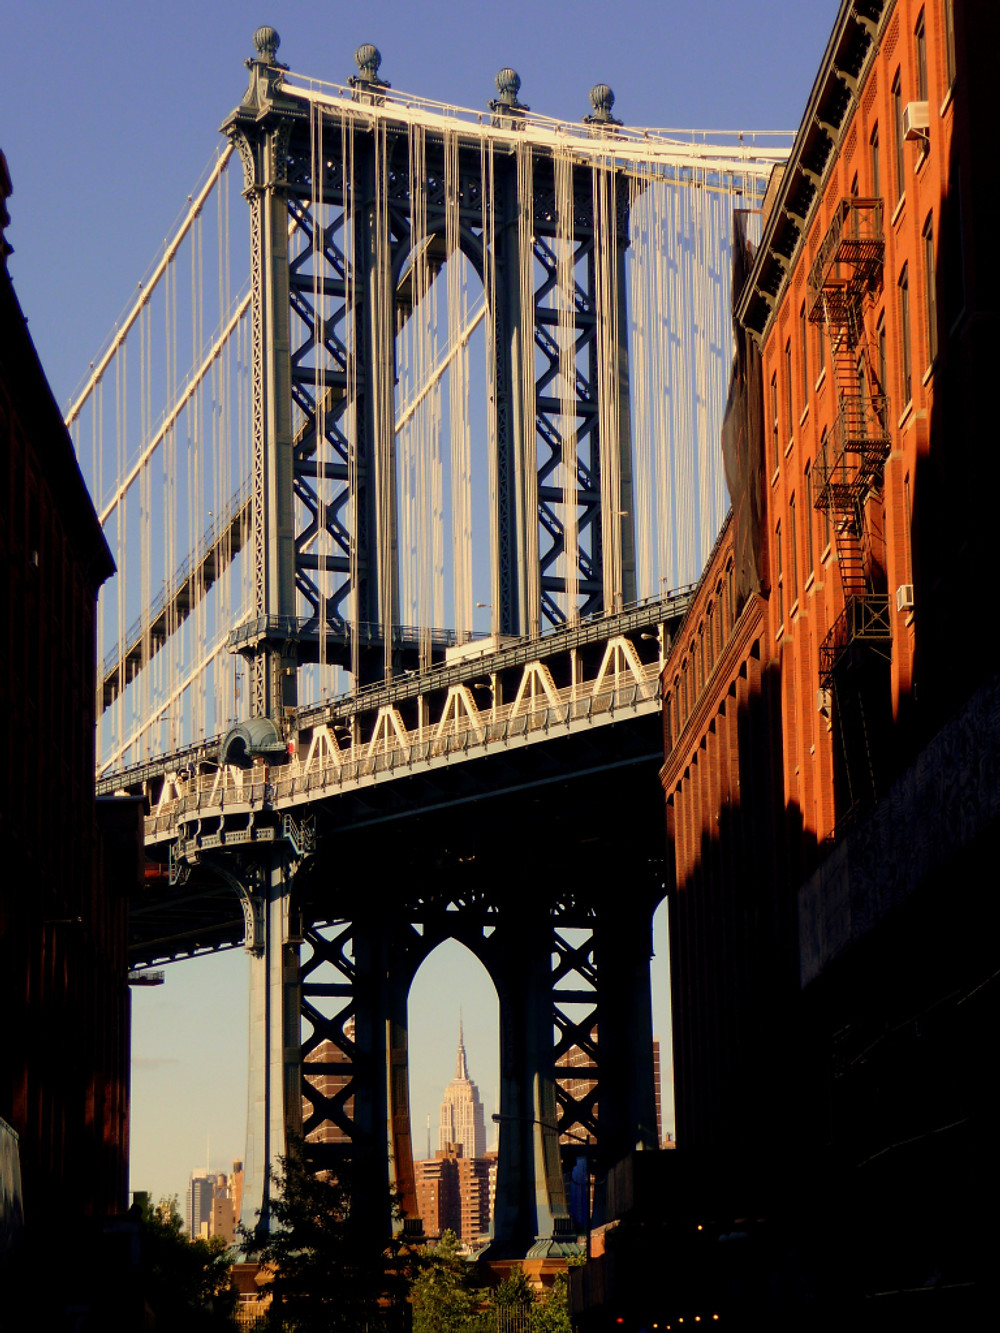 new york 2-3-4-5-6 022